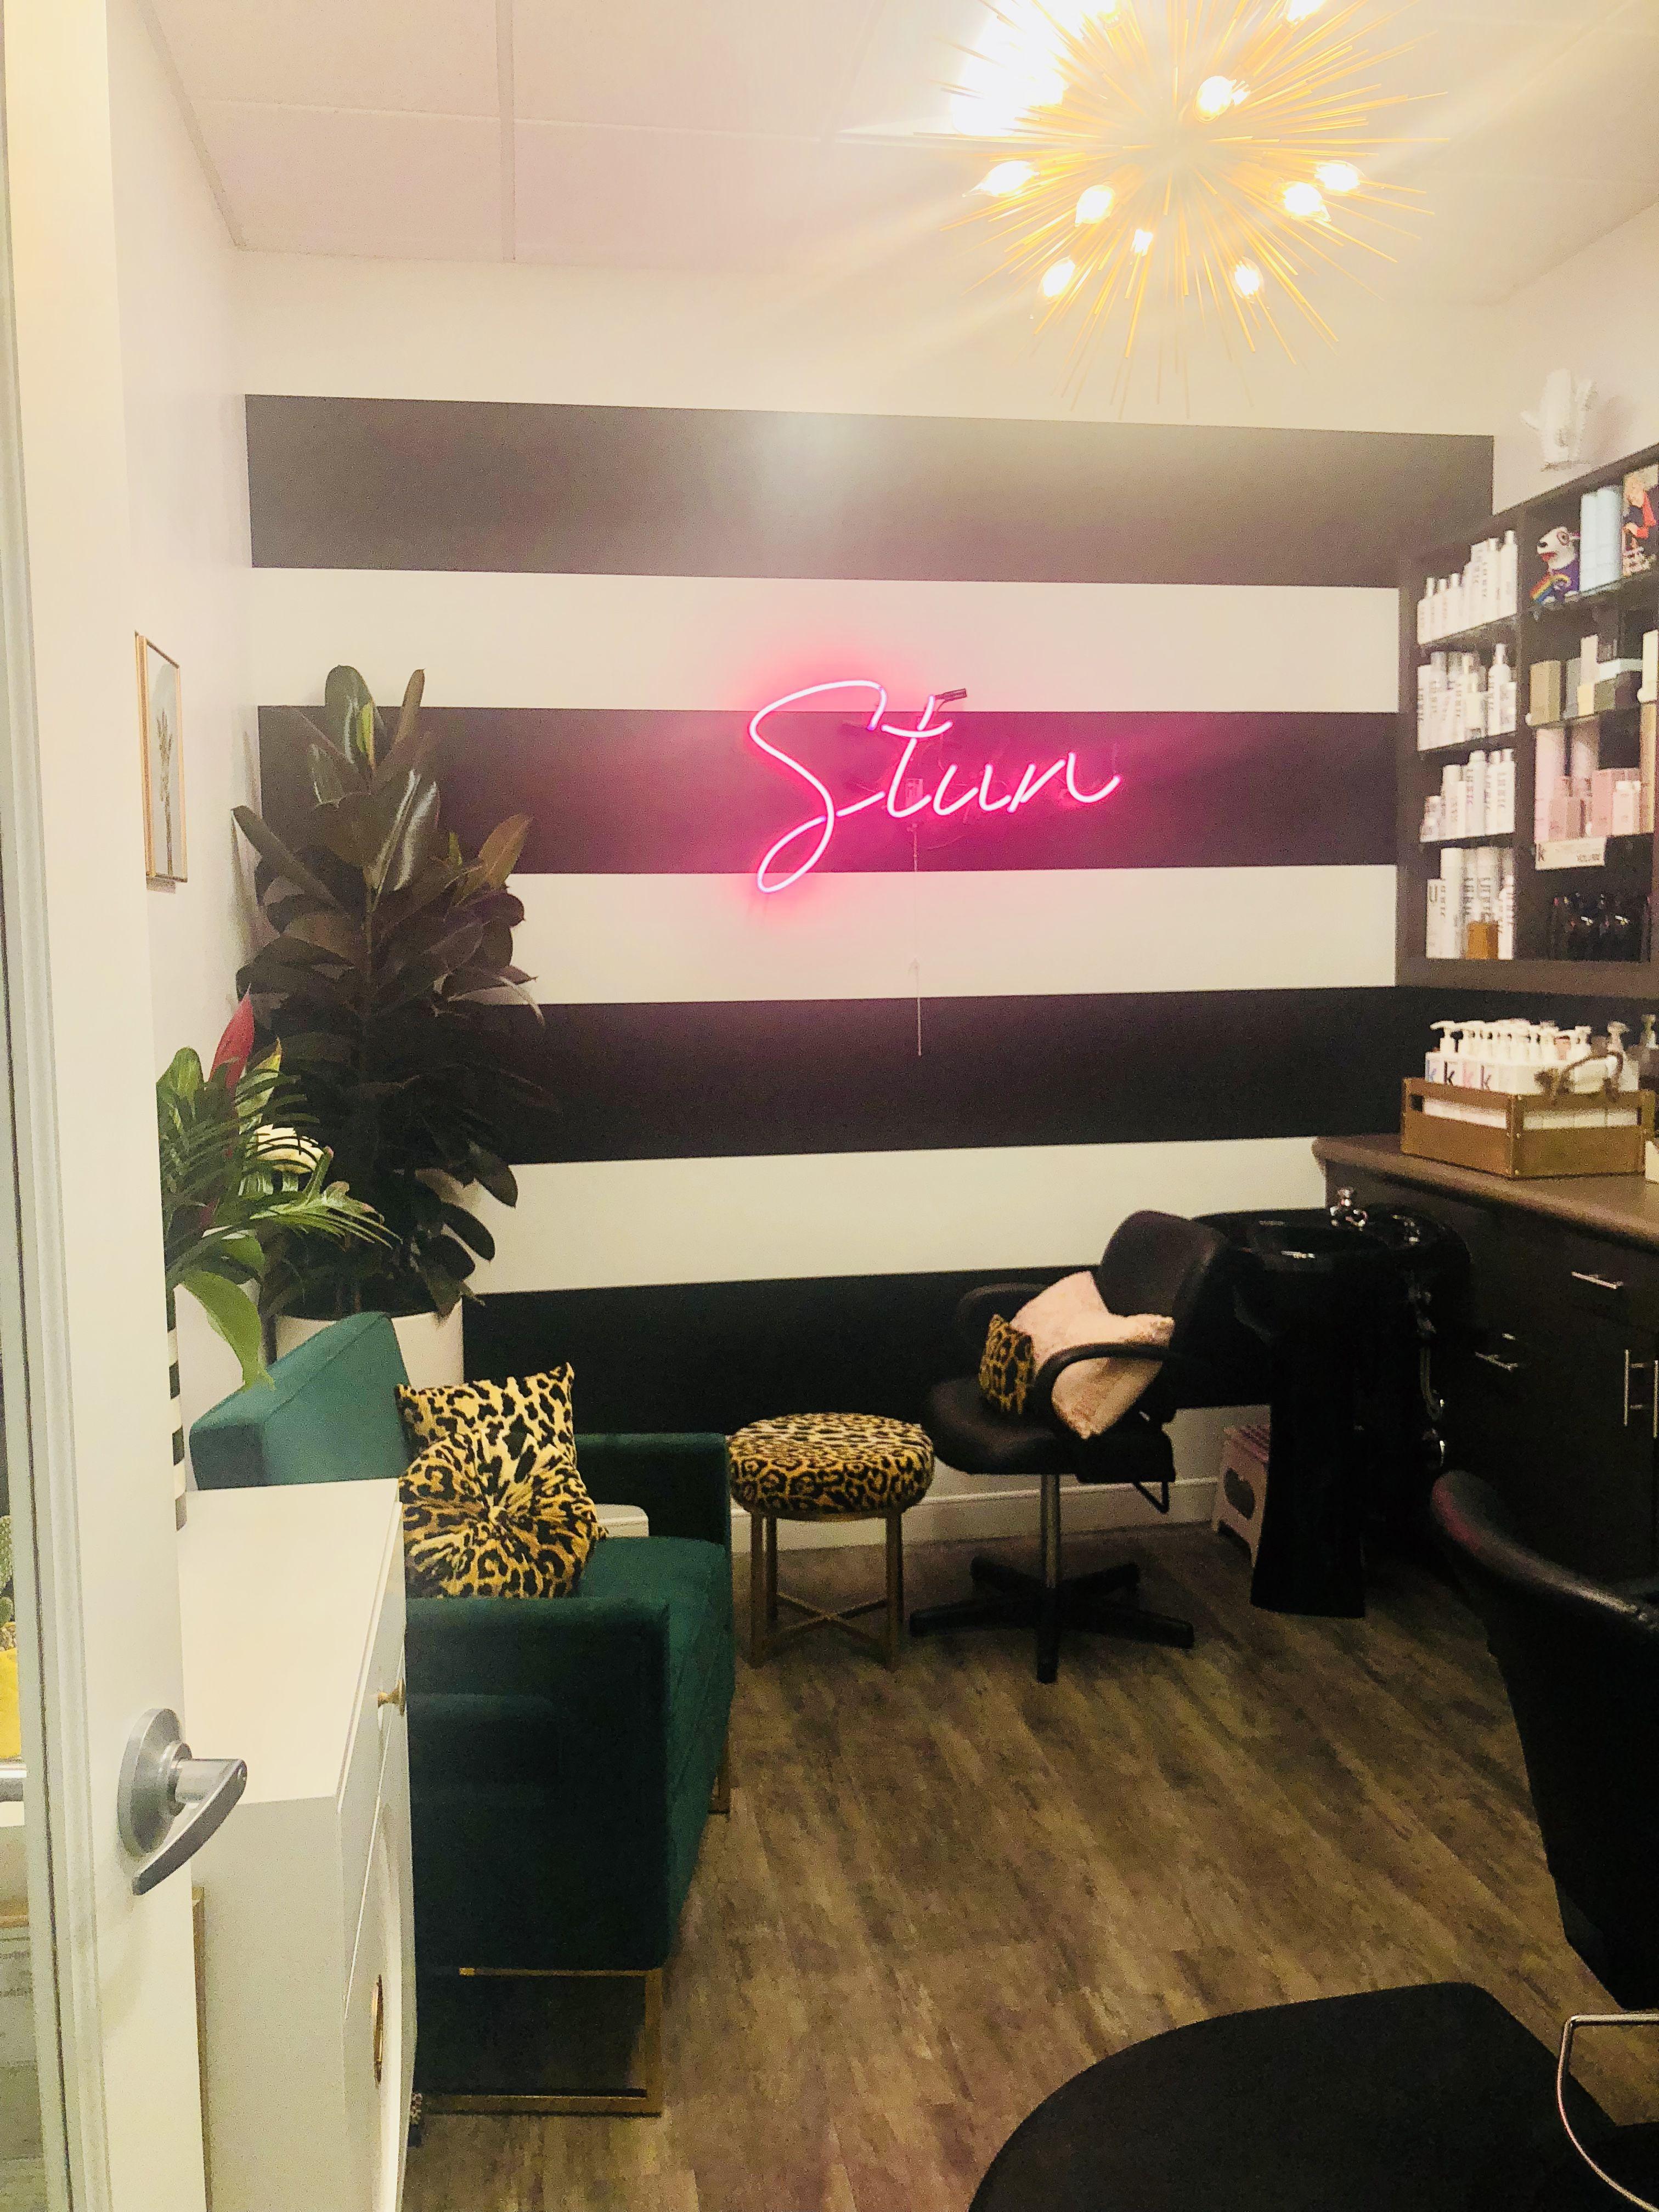 Stun Studio Salon Alamo Ca Salon Suites Studio Salon Black And White Striped Wall Neon Sign Pink Neo Salon Suites Decor Salon Interior Design Home Hair Salons